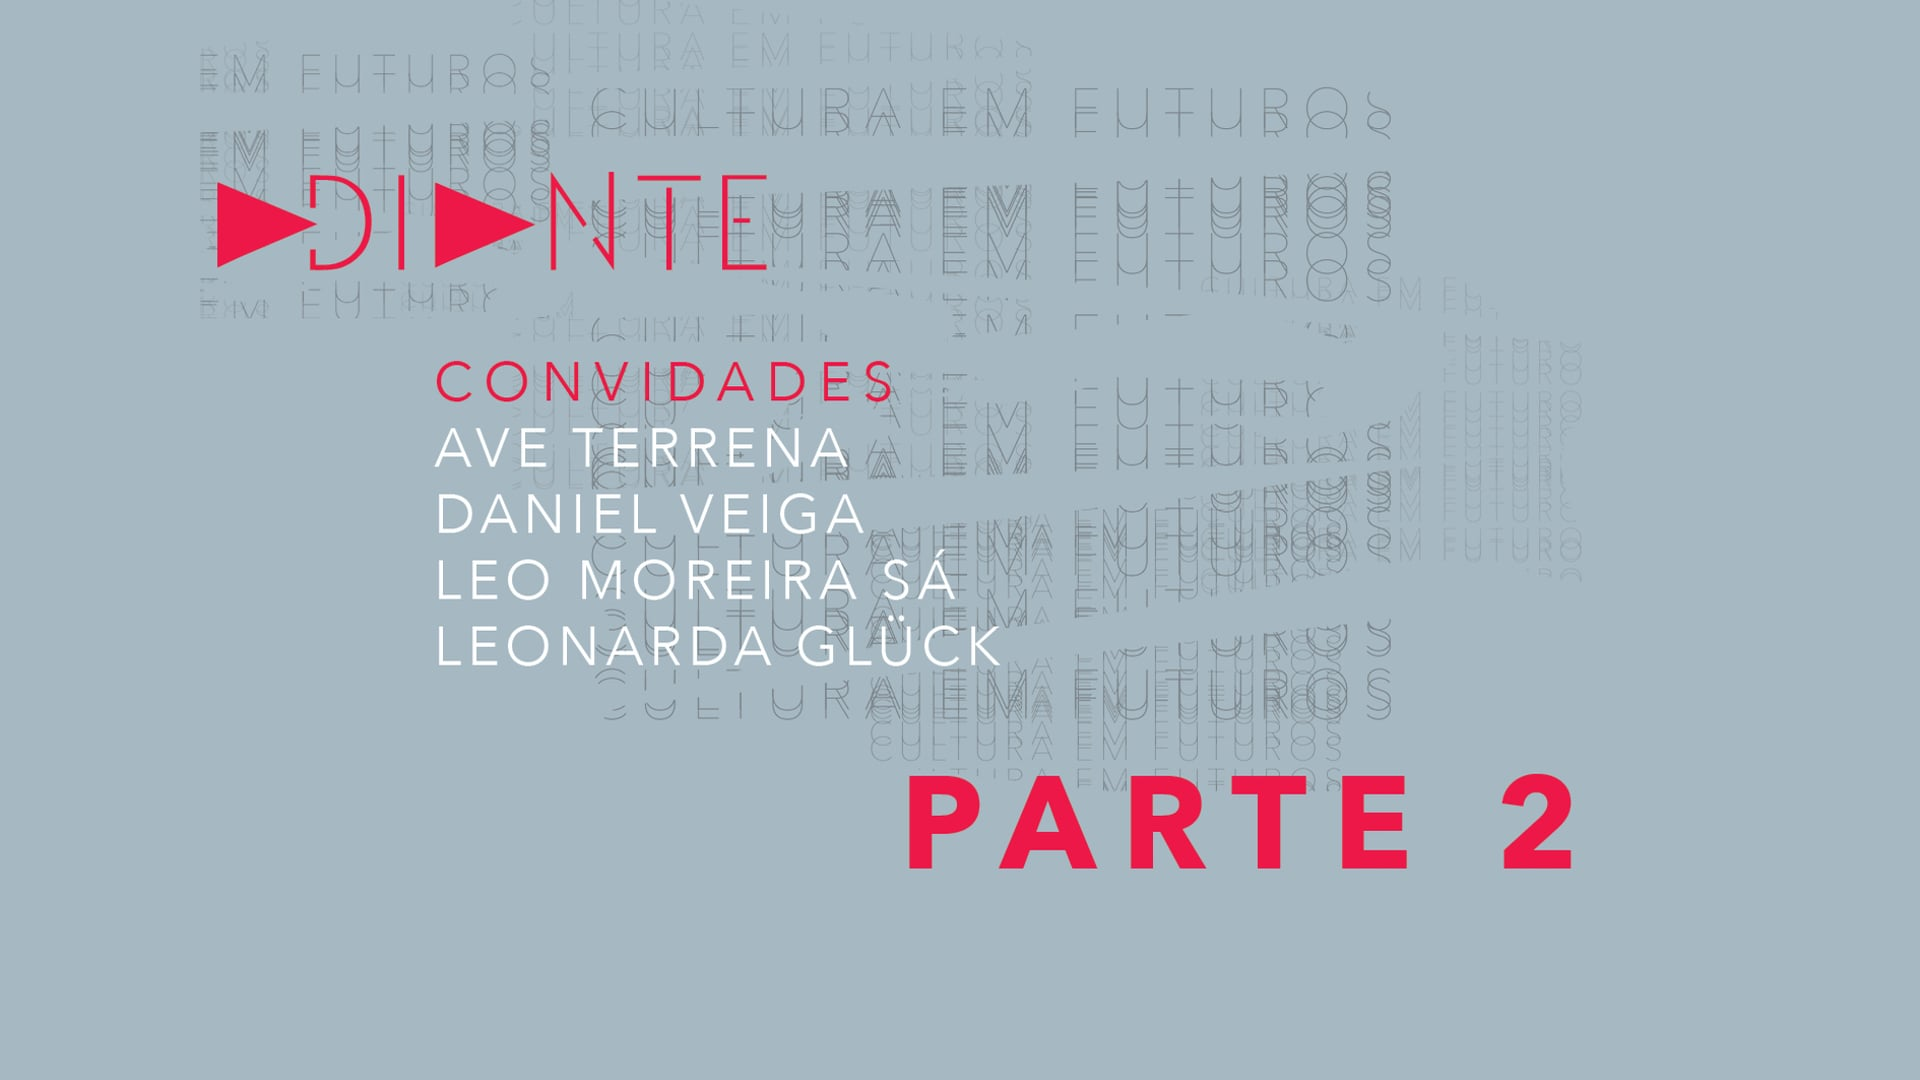 ADIANTE > Parte 2: Ave Terrena + Daniel Veiga + Leo Moreira Sá + Leonarda Glück